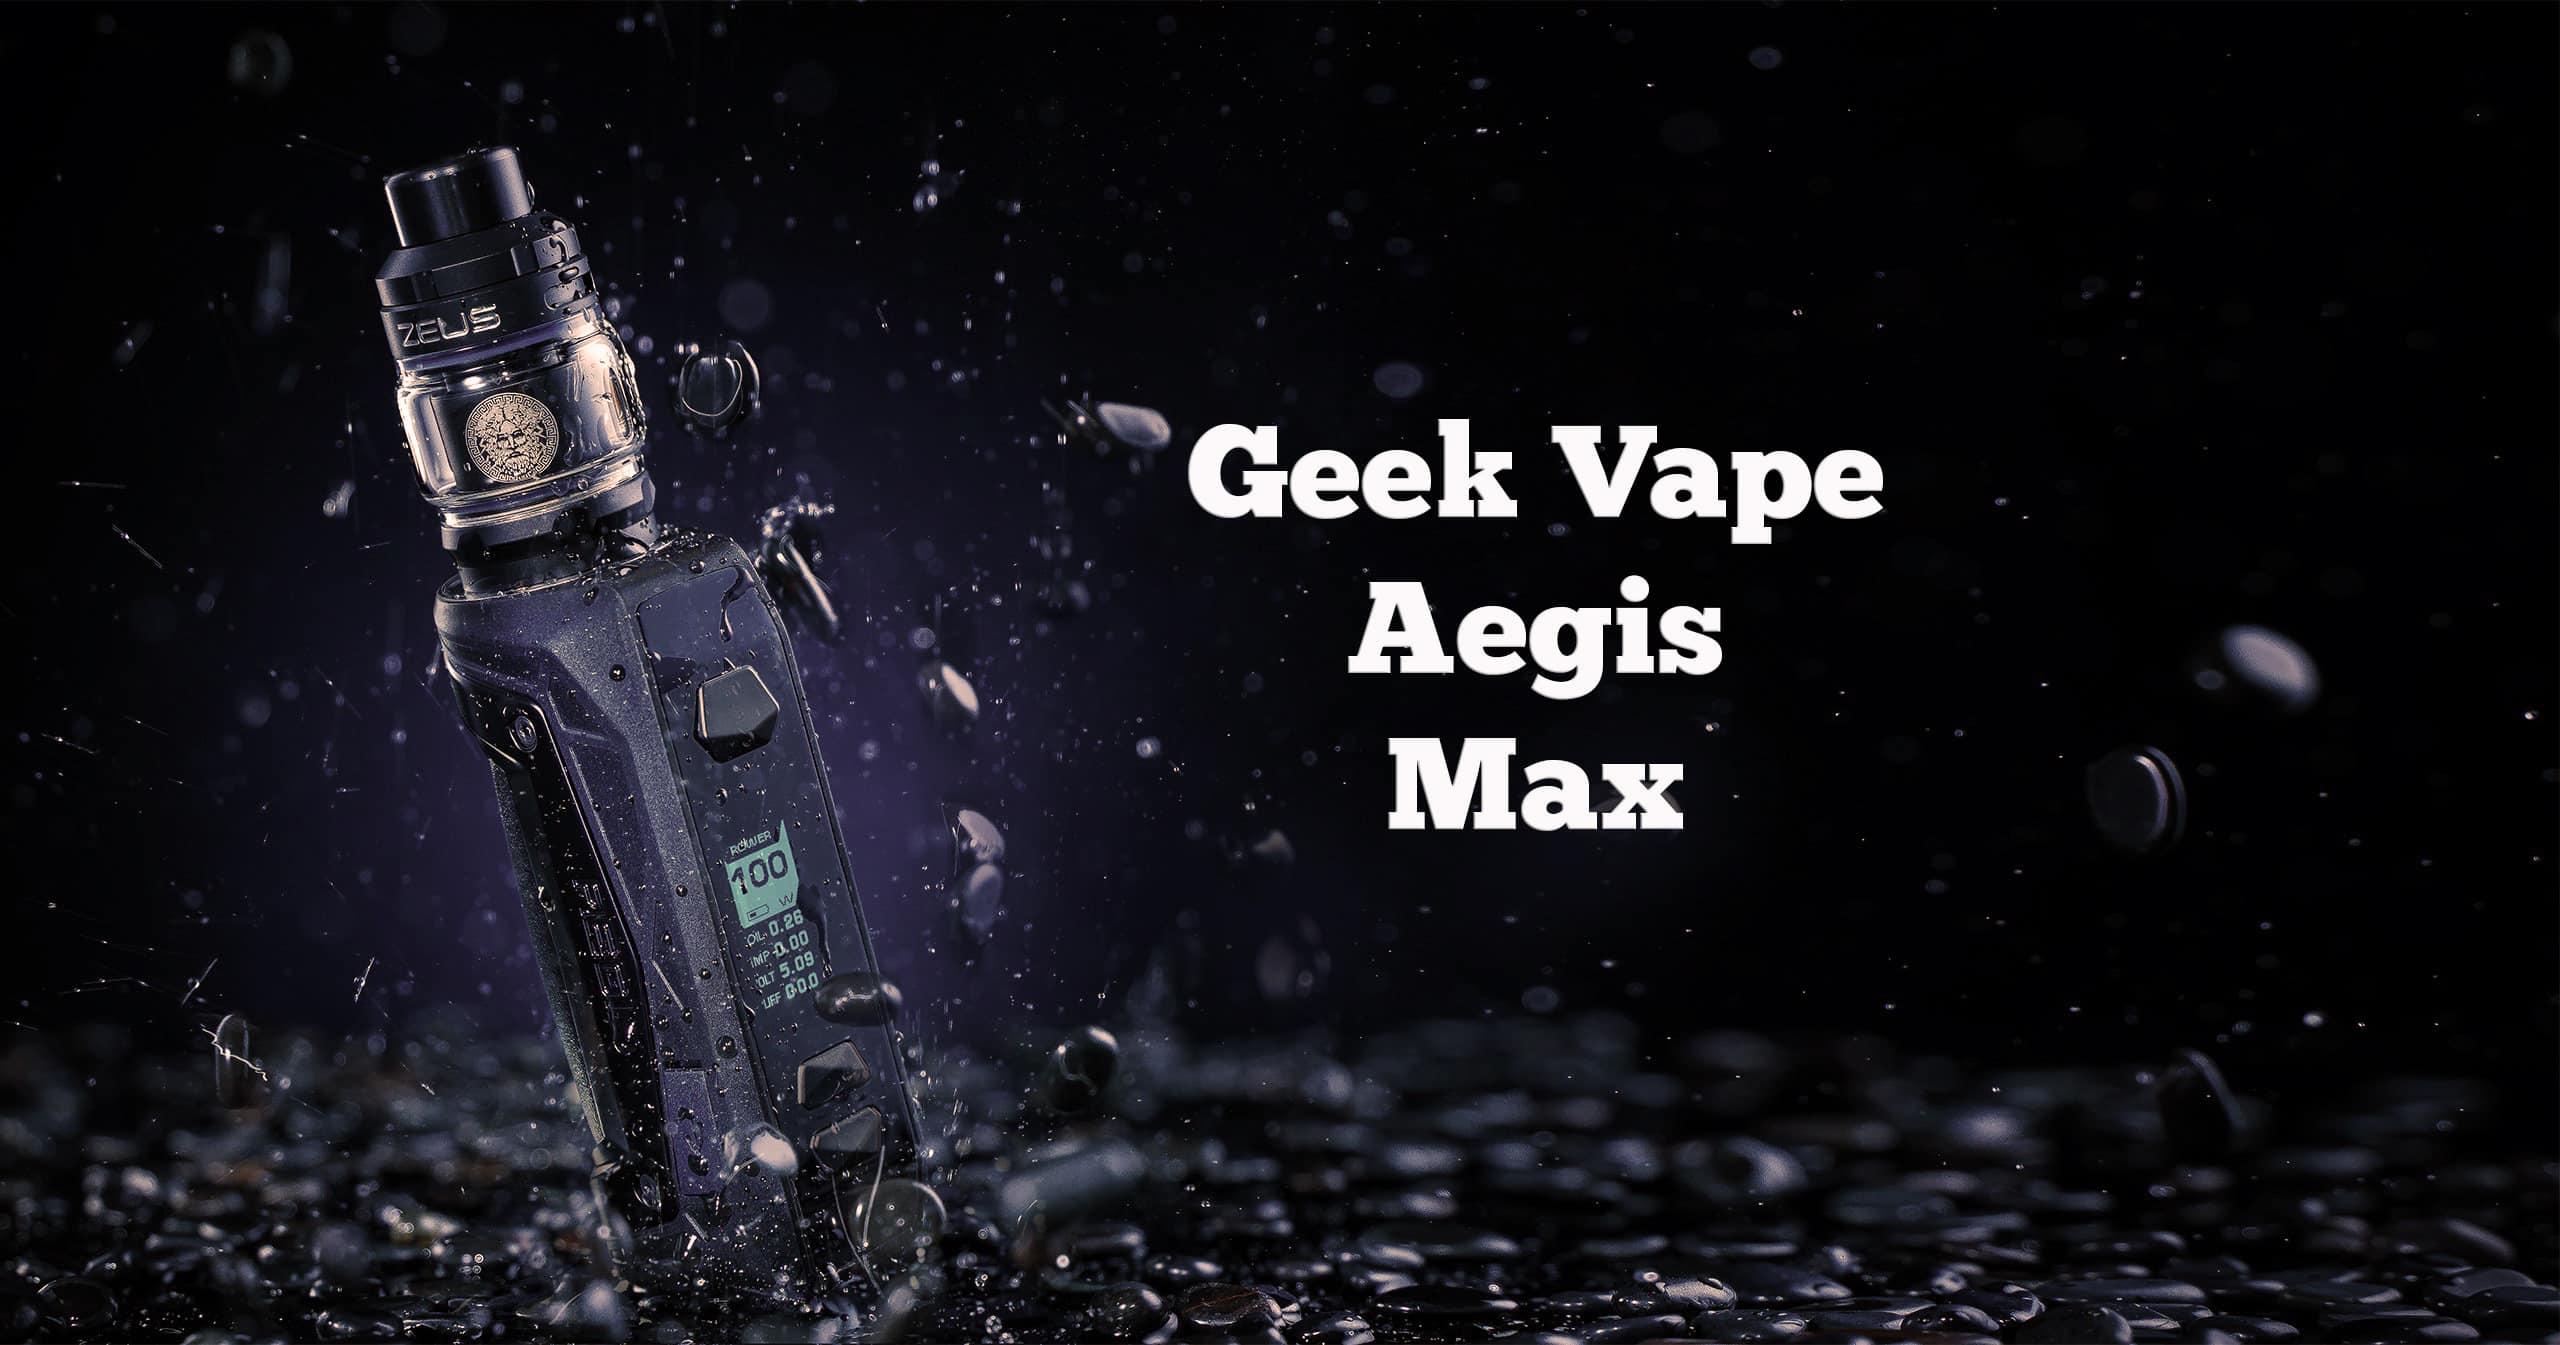 mod tigara electronica geek vape aegis max, geekvape aegis max